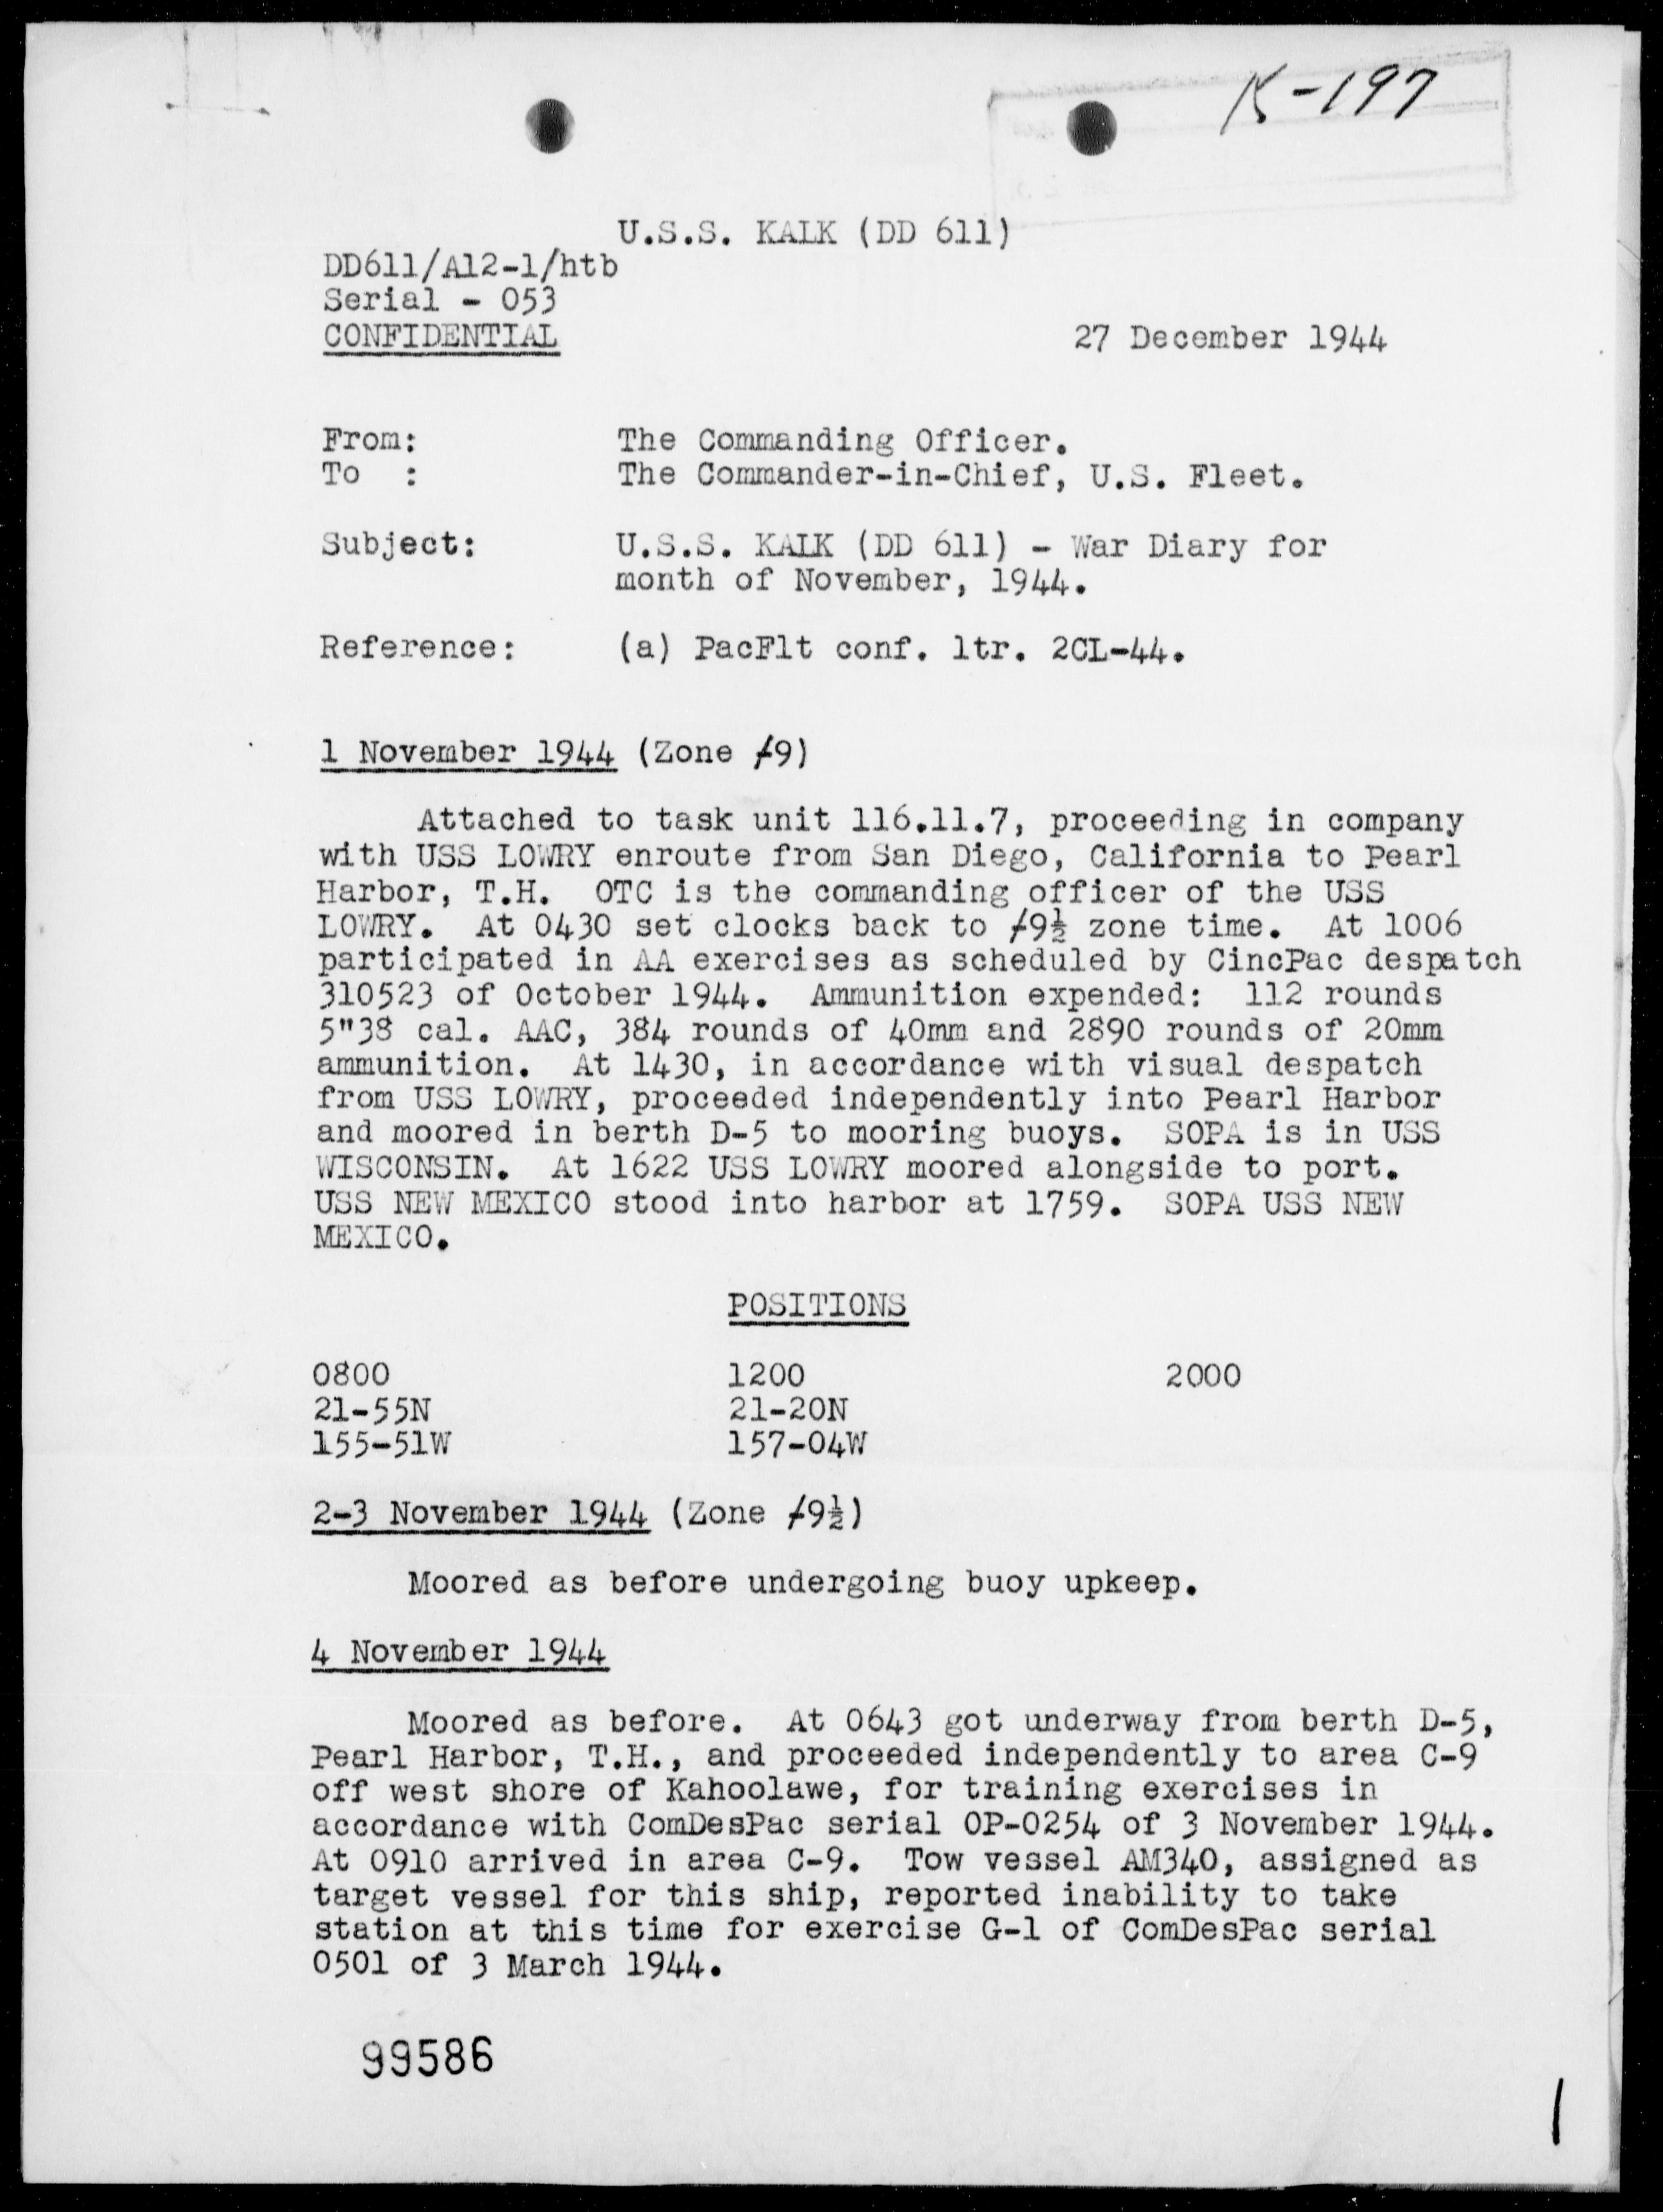 USS KALK - War Diary, 11/1-30/44